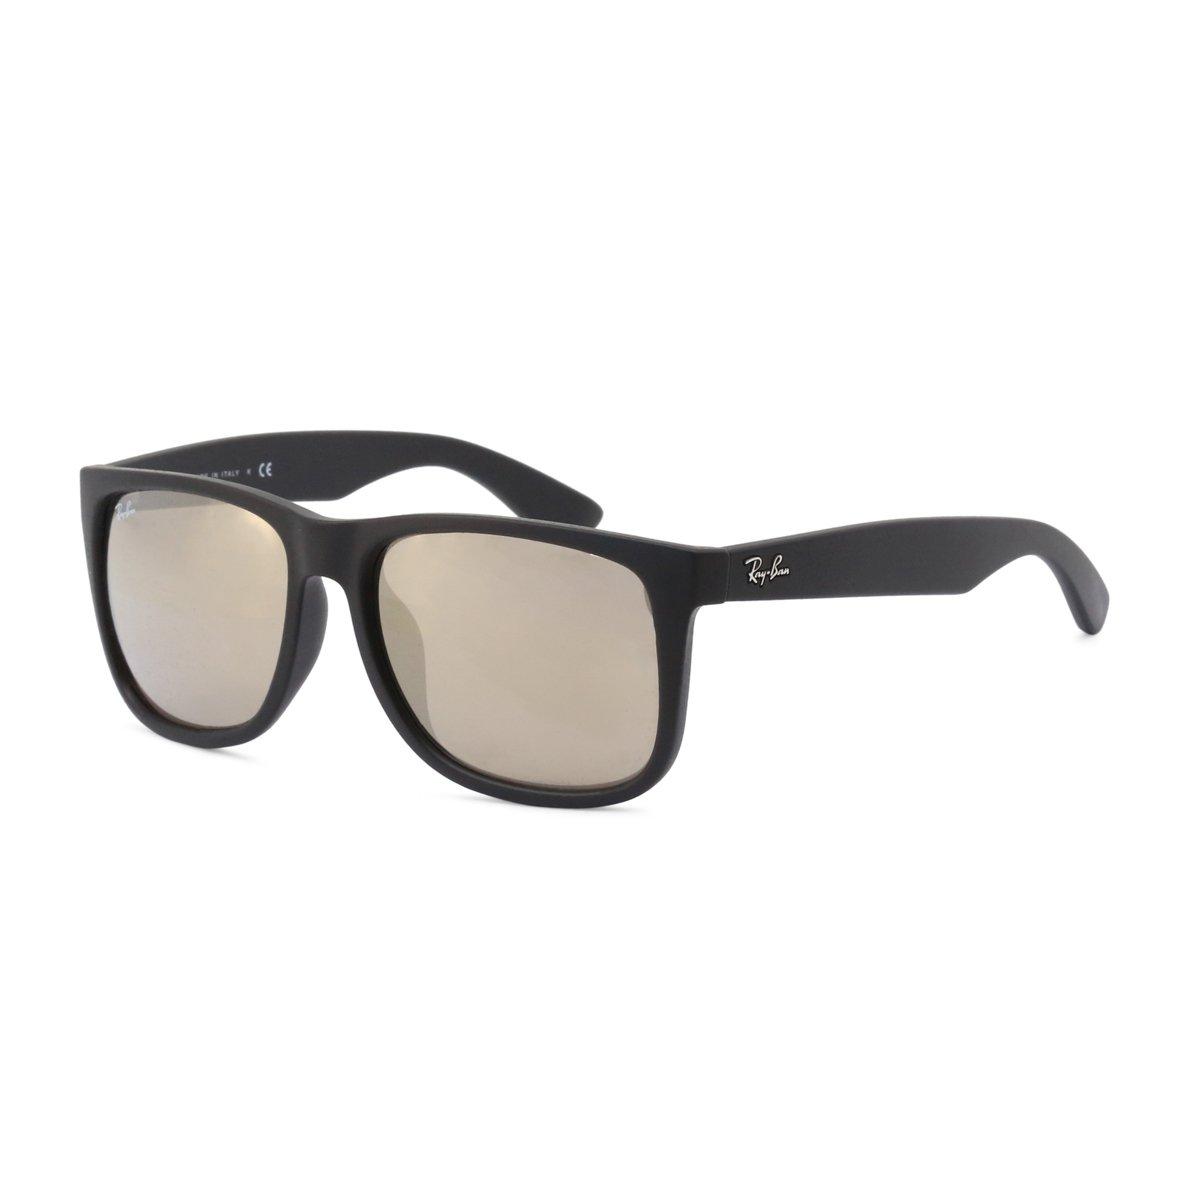 Ray-Ban Unisex Sunglasses Black 0RB4165F - black-2 NOSIZE